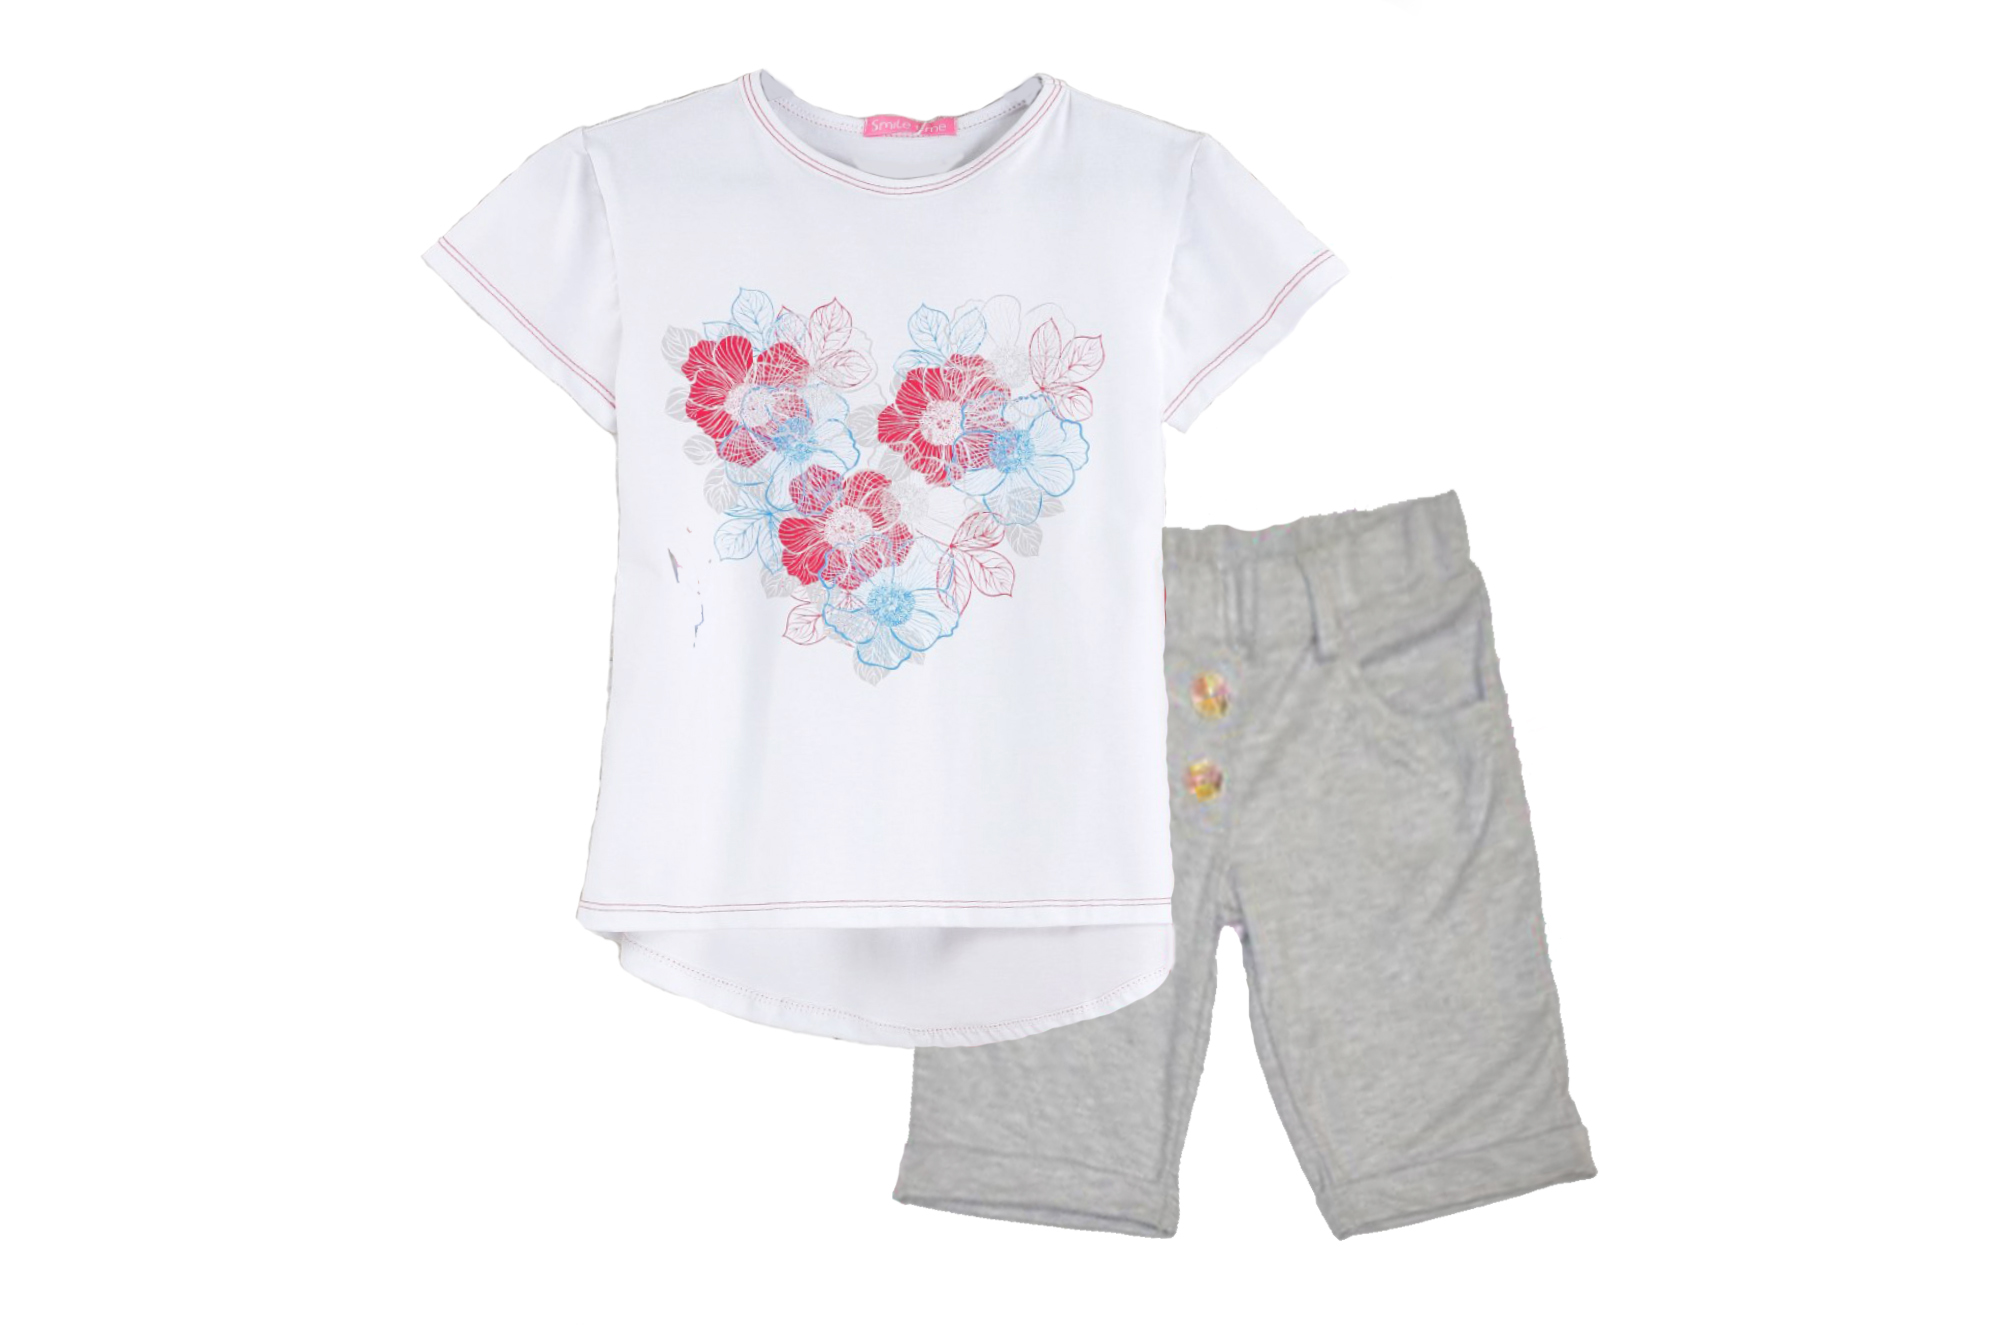 Костюм SmileTime для девочки Flower Heart шорты и футболка, меланж